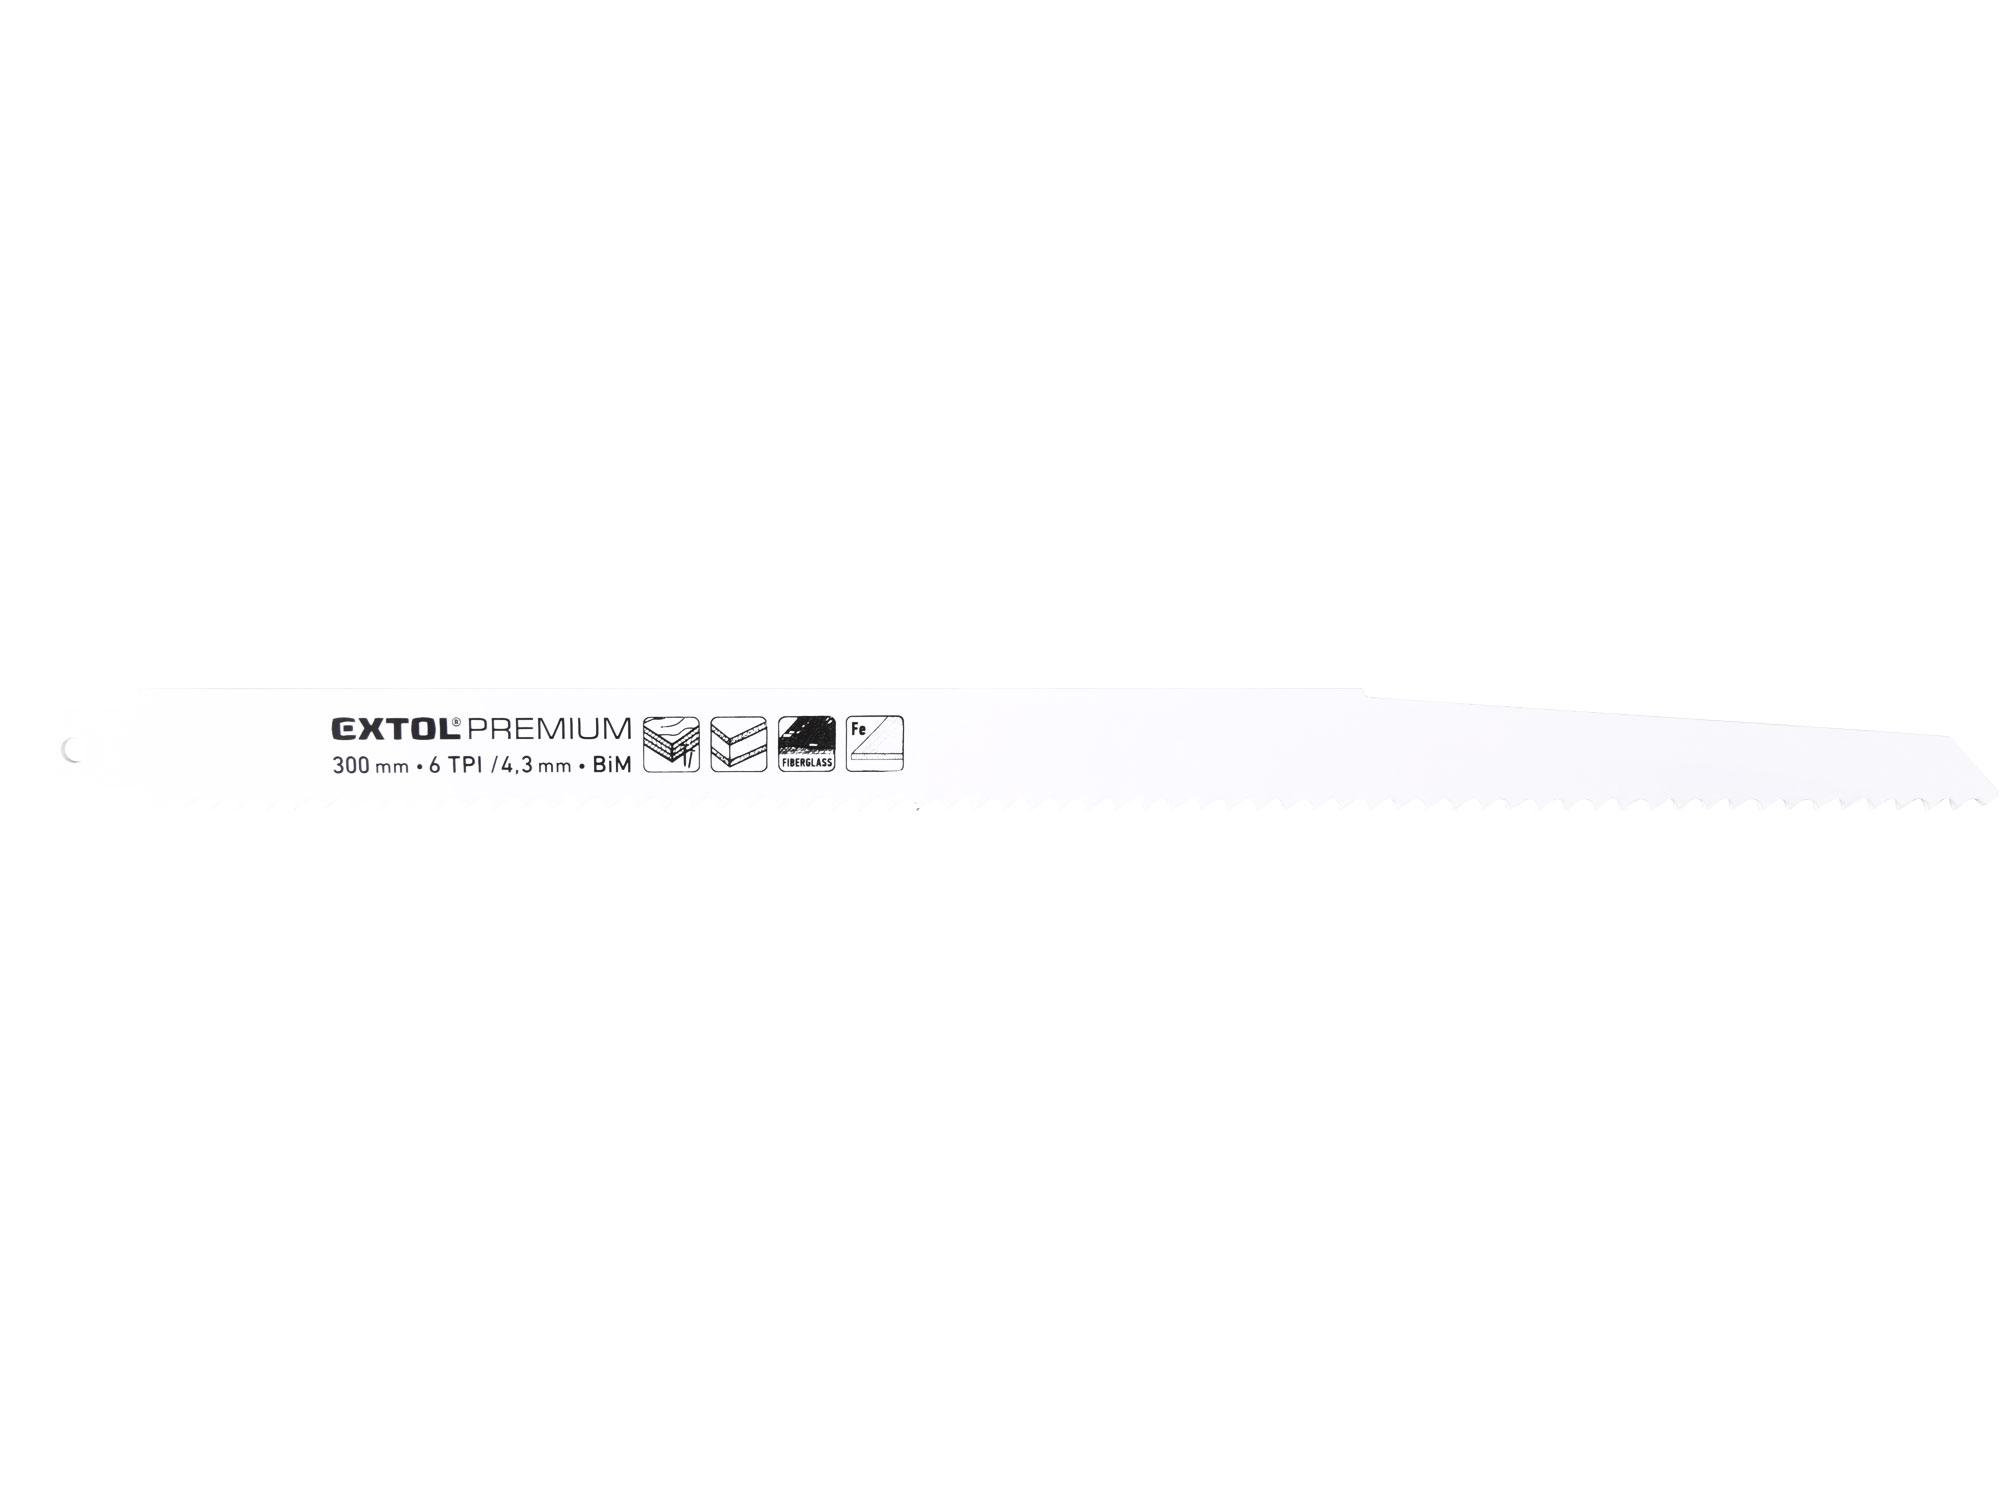 3pcs Sabre/Reciprocating Saw Blade Set, 6T/inch, 300x19x1.25mm, Bi-metal